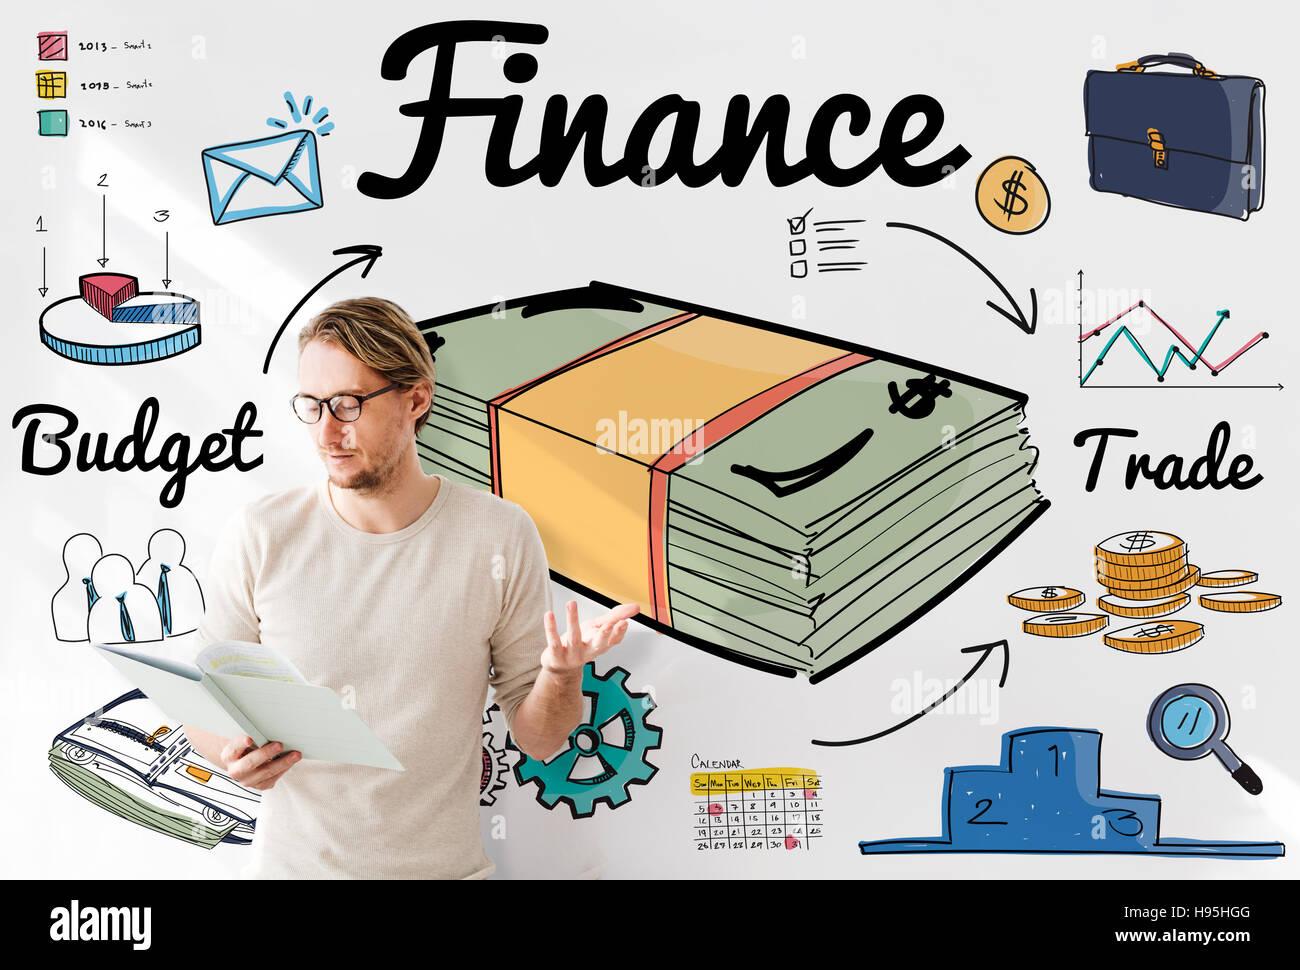 Finance Money Debt Expenditure Trade Concept Stock Photo